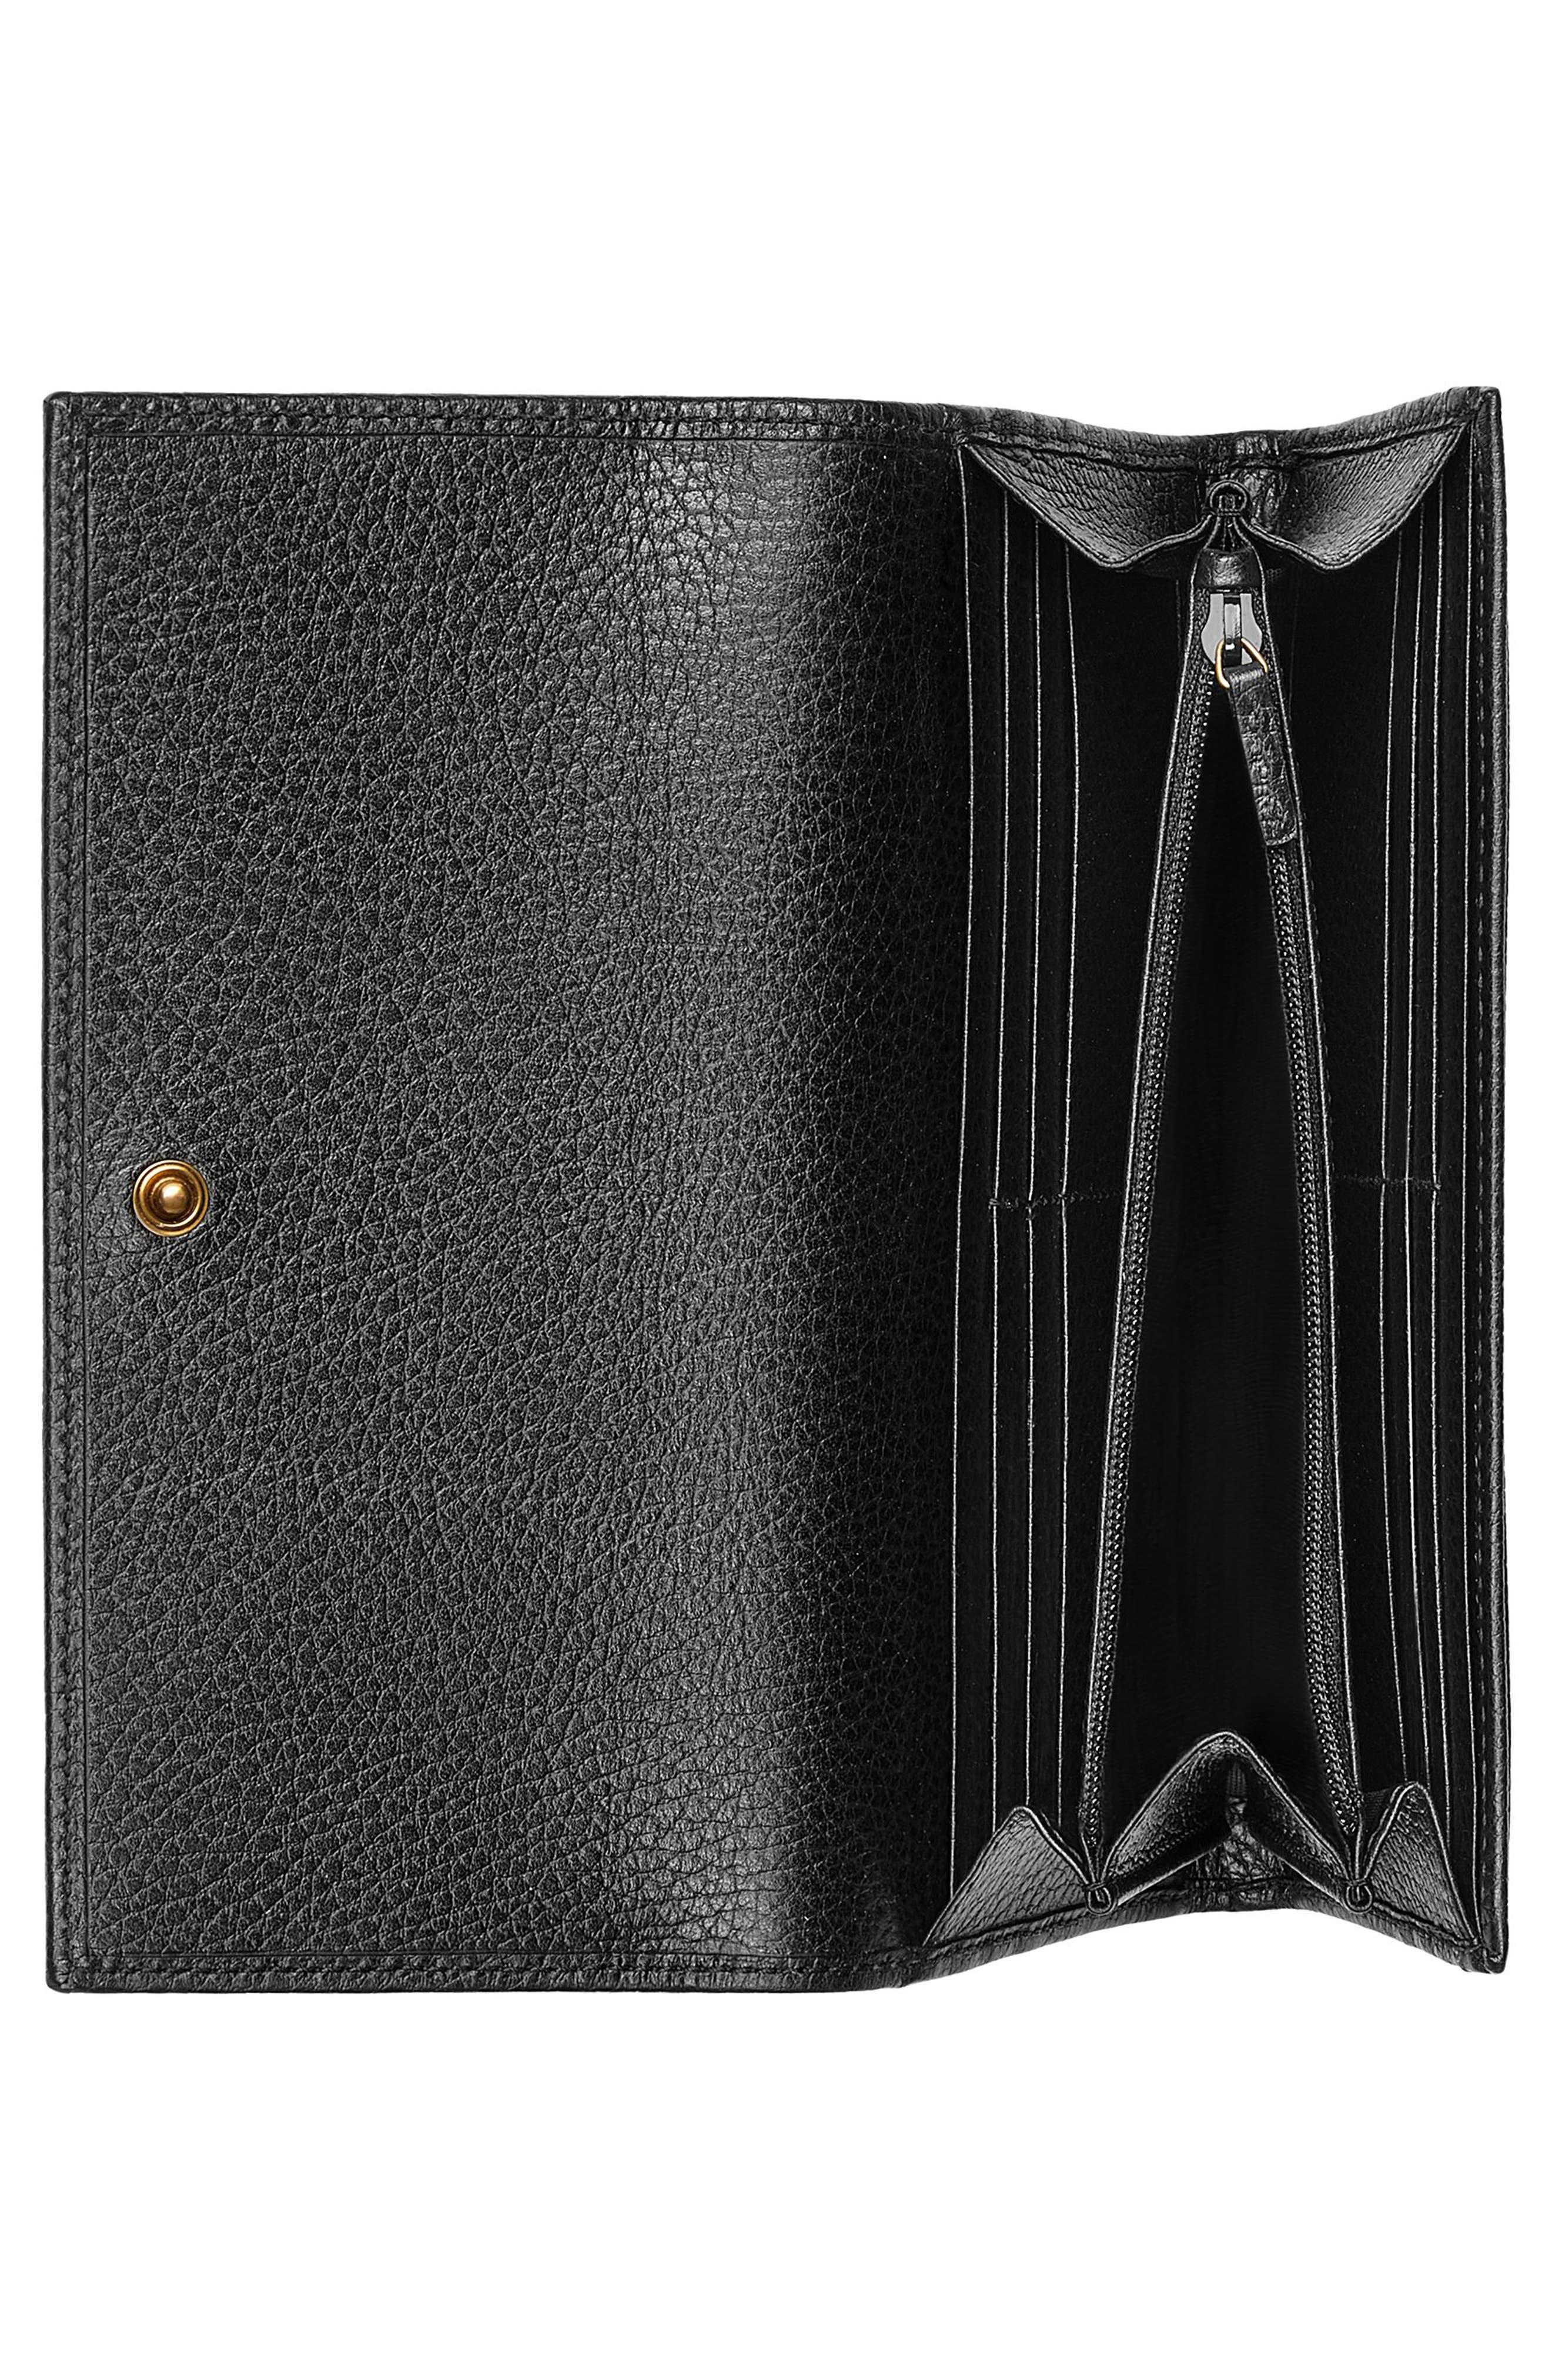 Farfalla Leather Continental Wallet,                             Alternate thumbnail 2, color,                             Nero/ Crystal